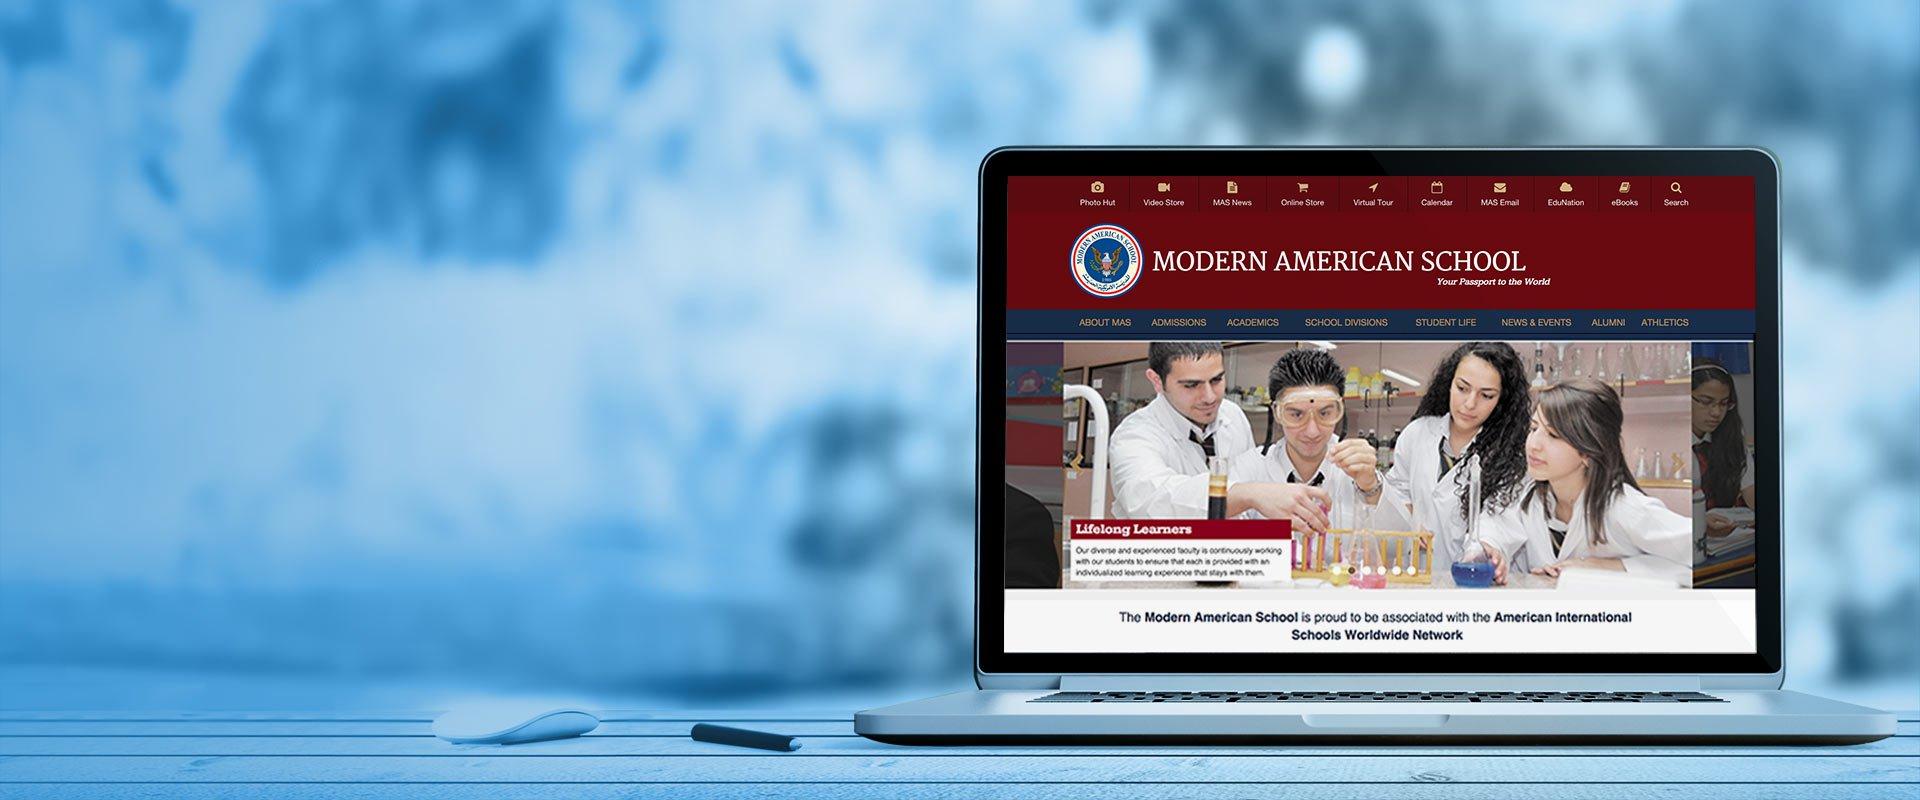 Education, primary school, modern american